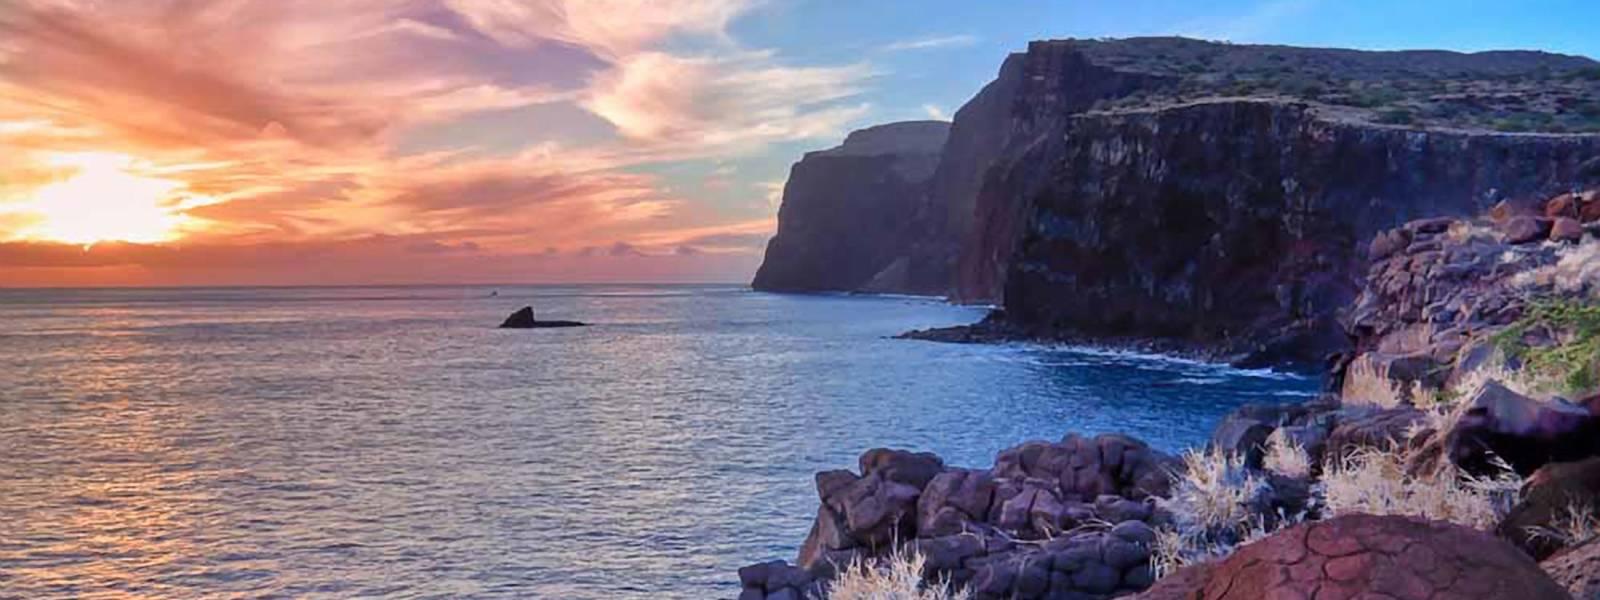 Hawaii Island Hop - Oahu, Lanai & Maui   Hayes & Jarvis